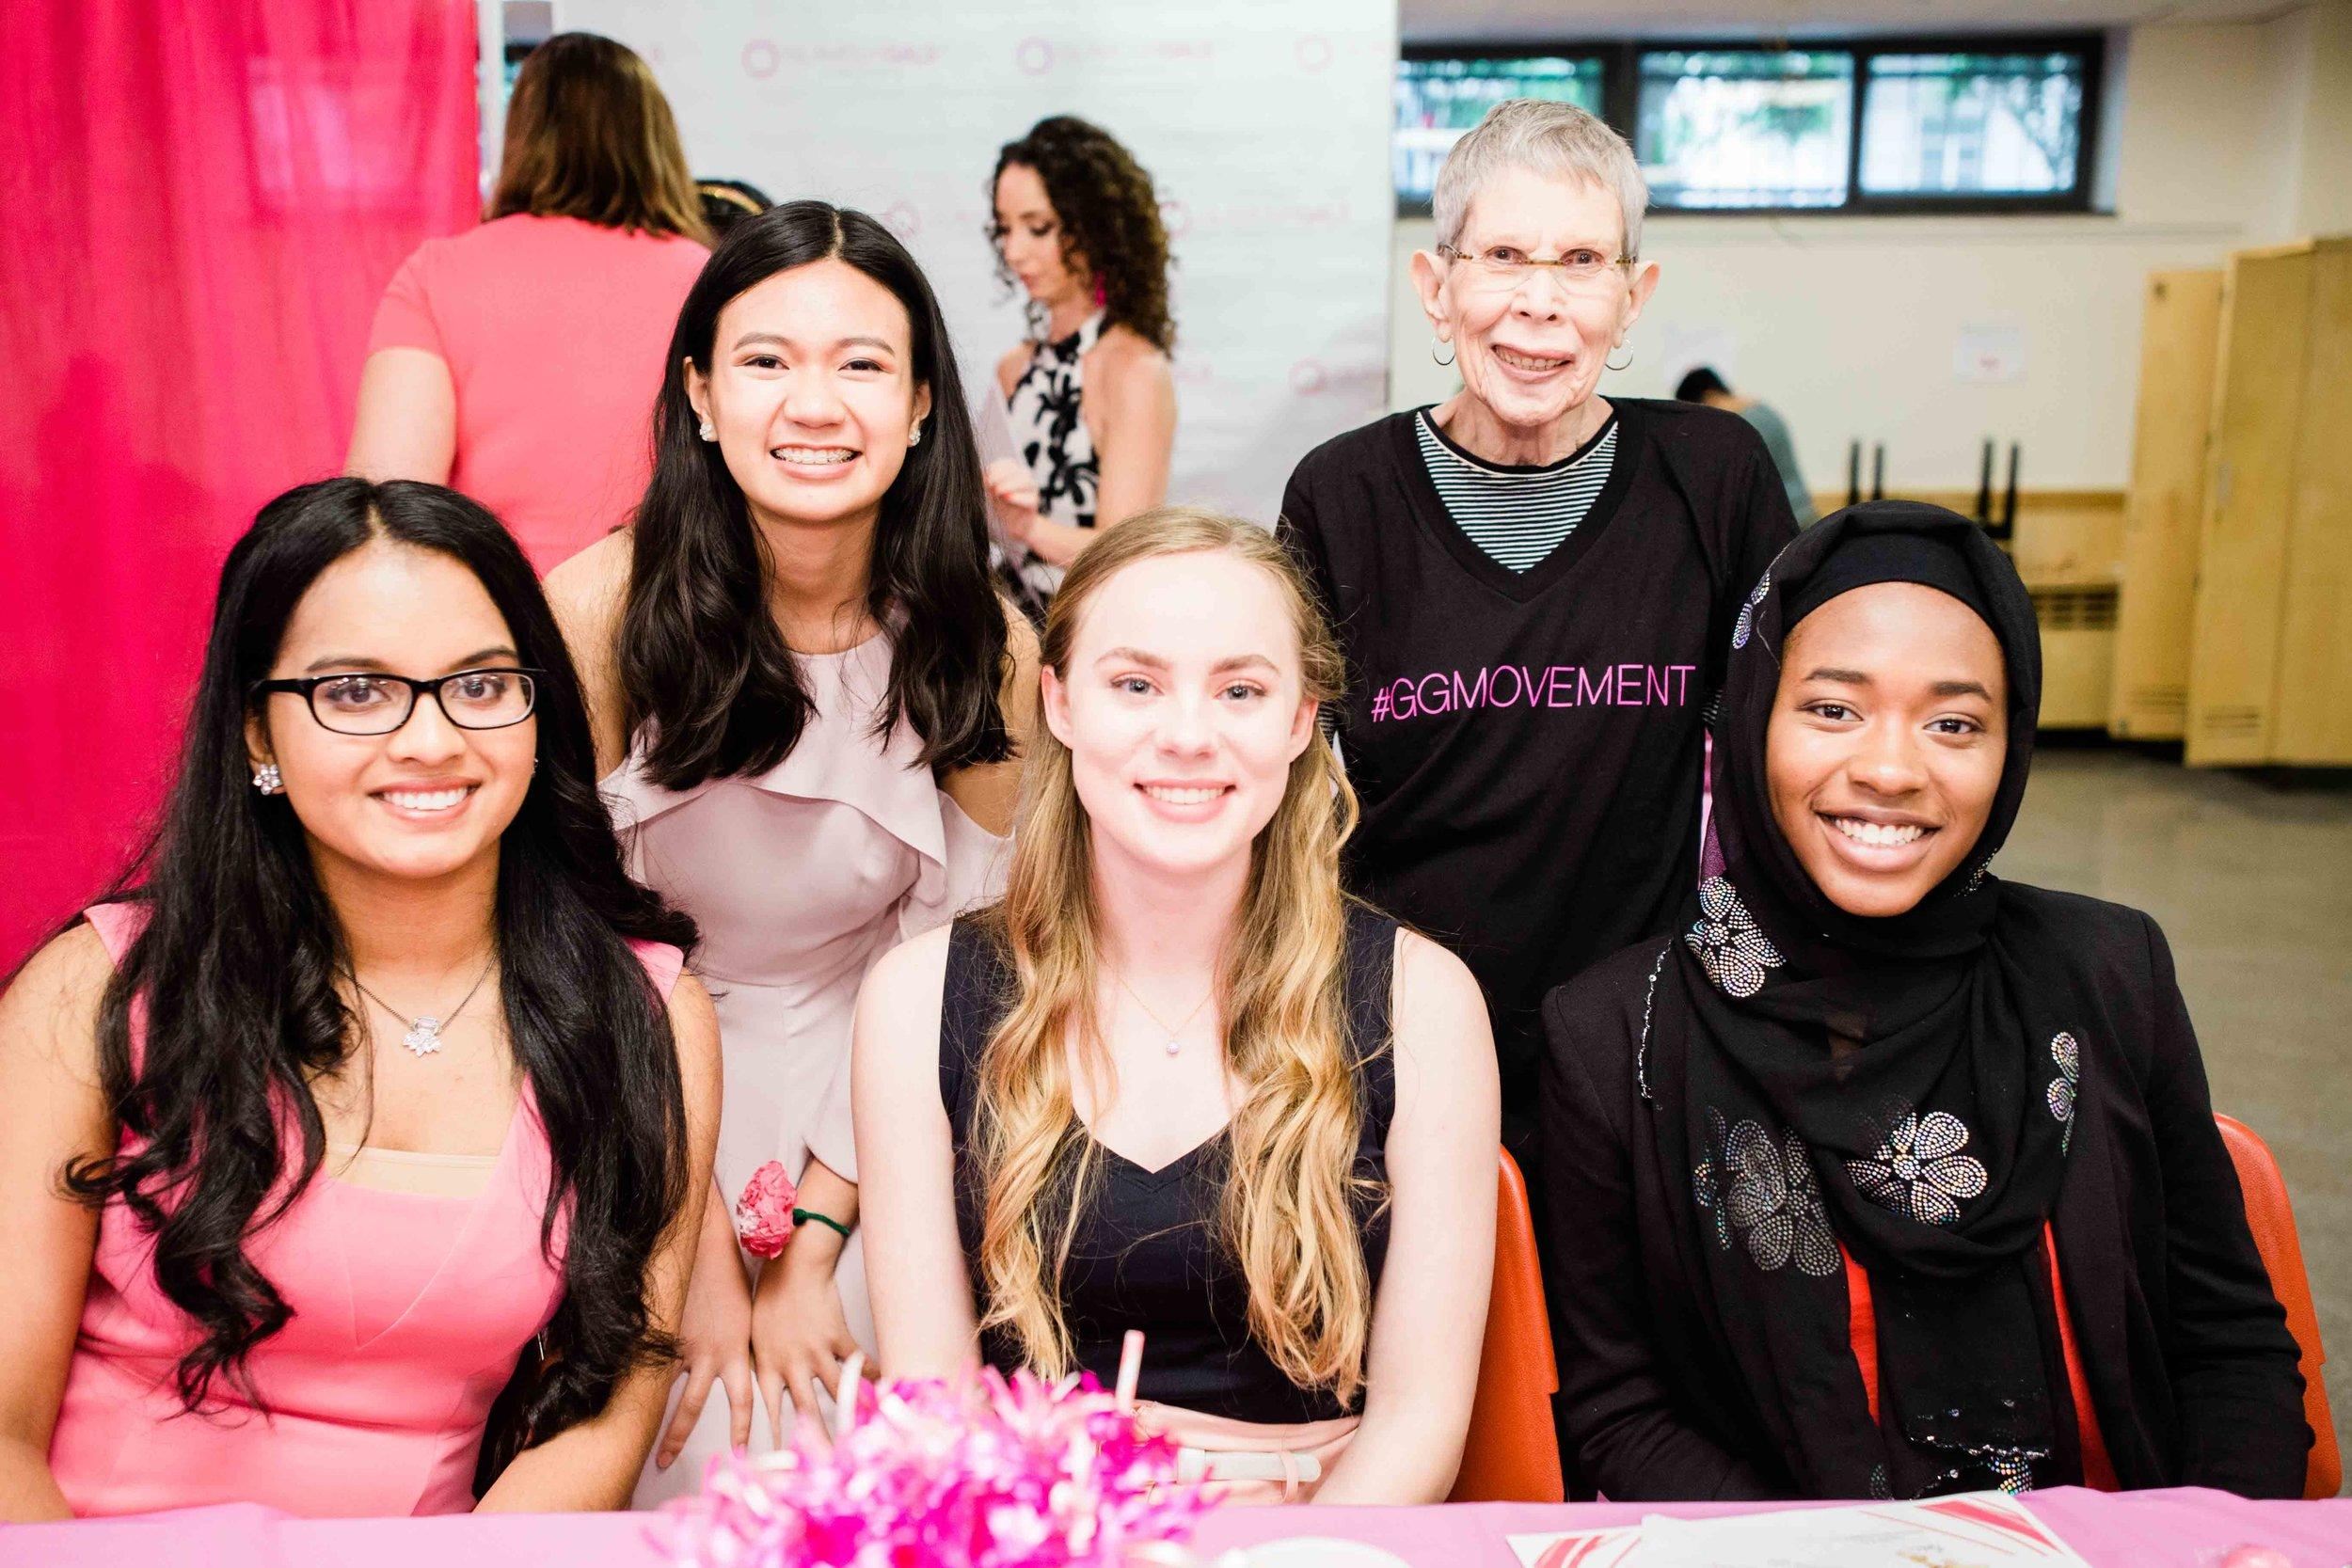 Clockwise from left: Alicia;Rheana;Rosalie, the Inspiration Glammy winner; Hafeezat; and Gretta.